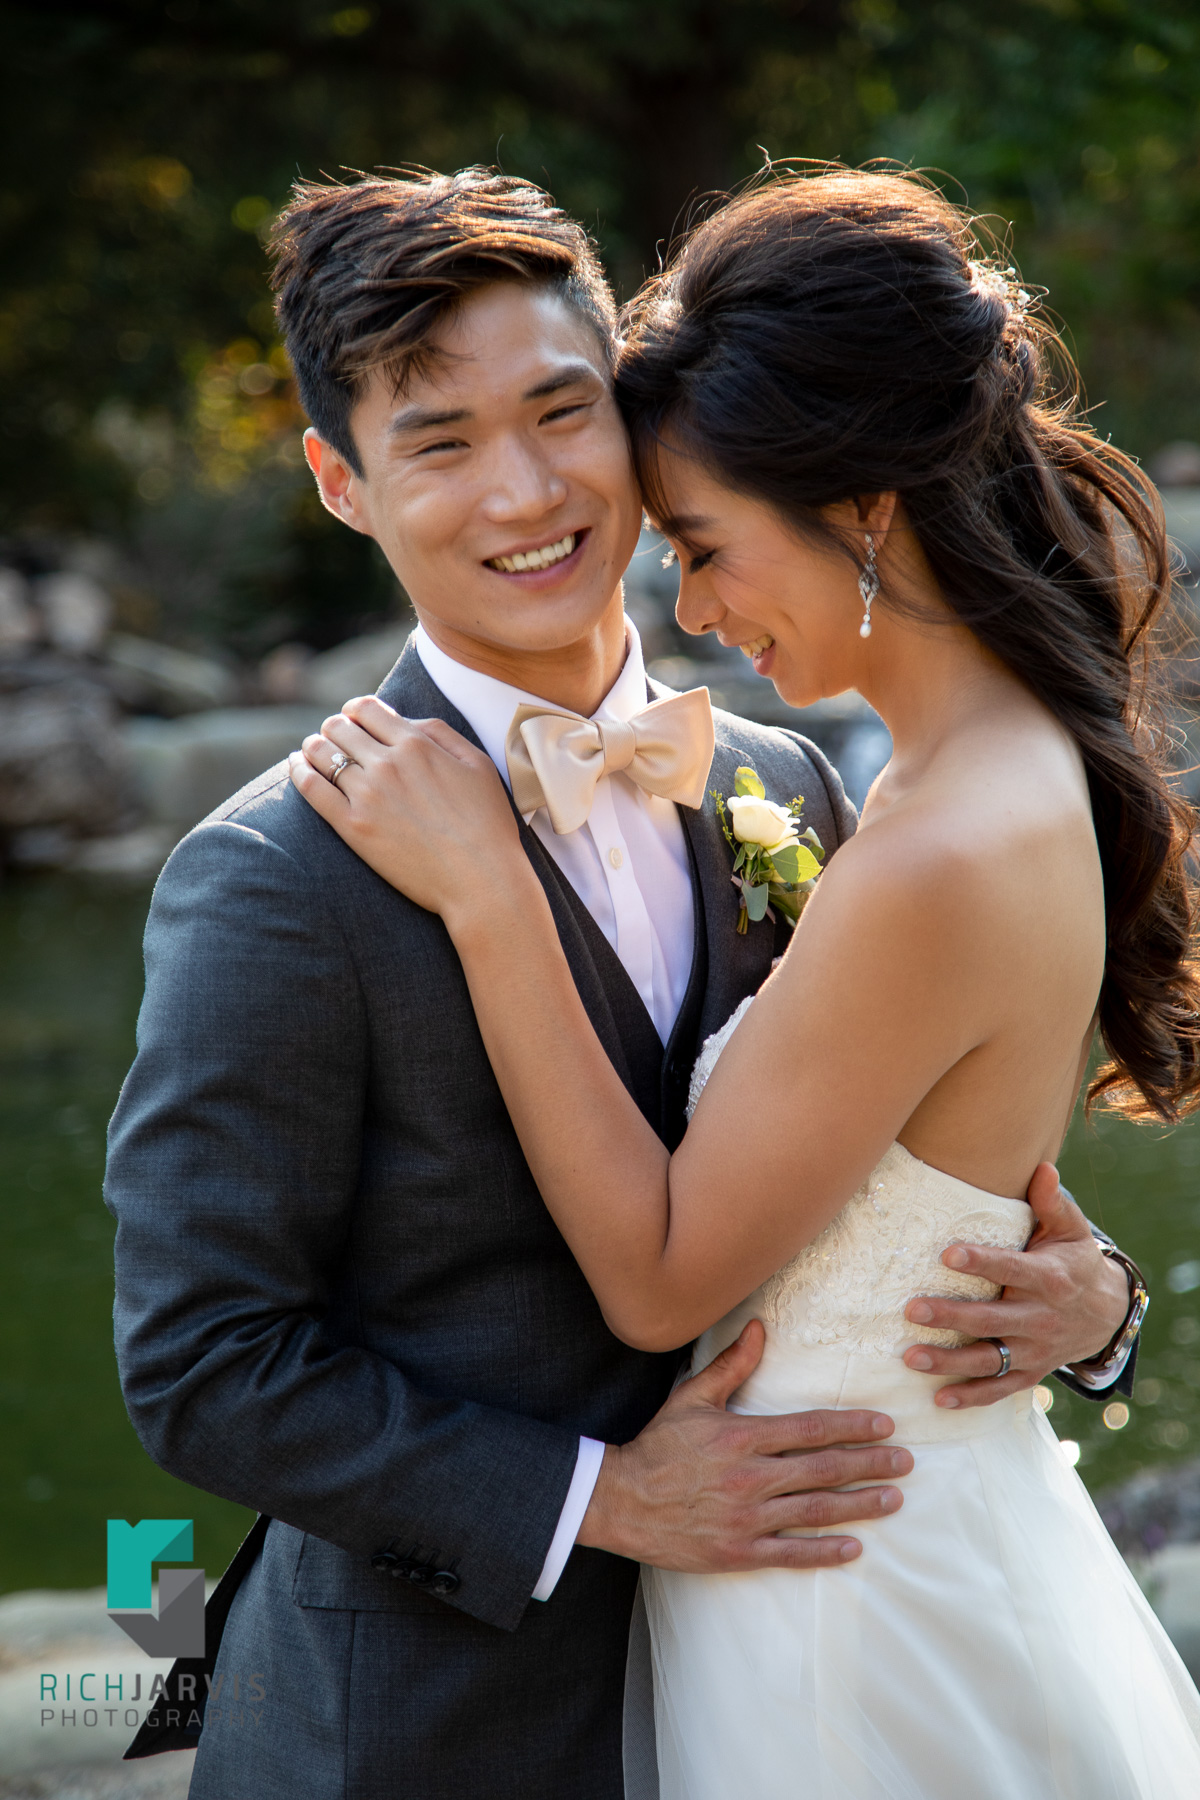 Rich Jarvis Photography Wedding22.jpg